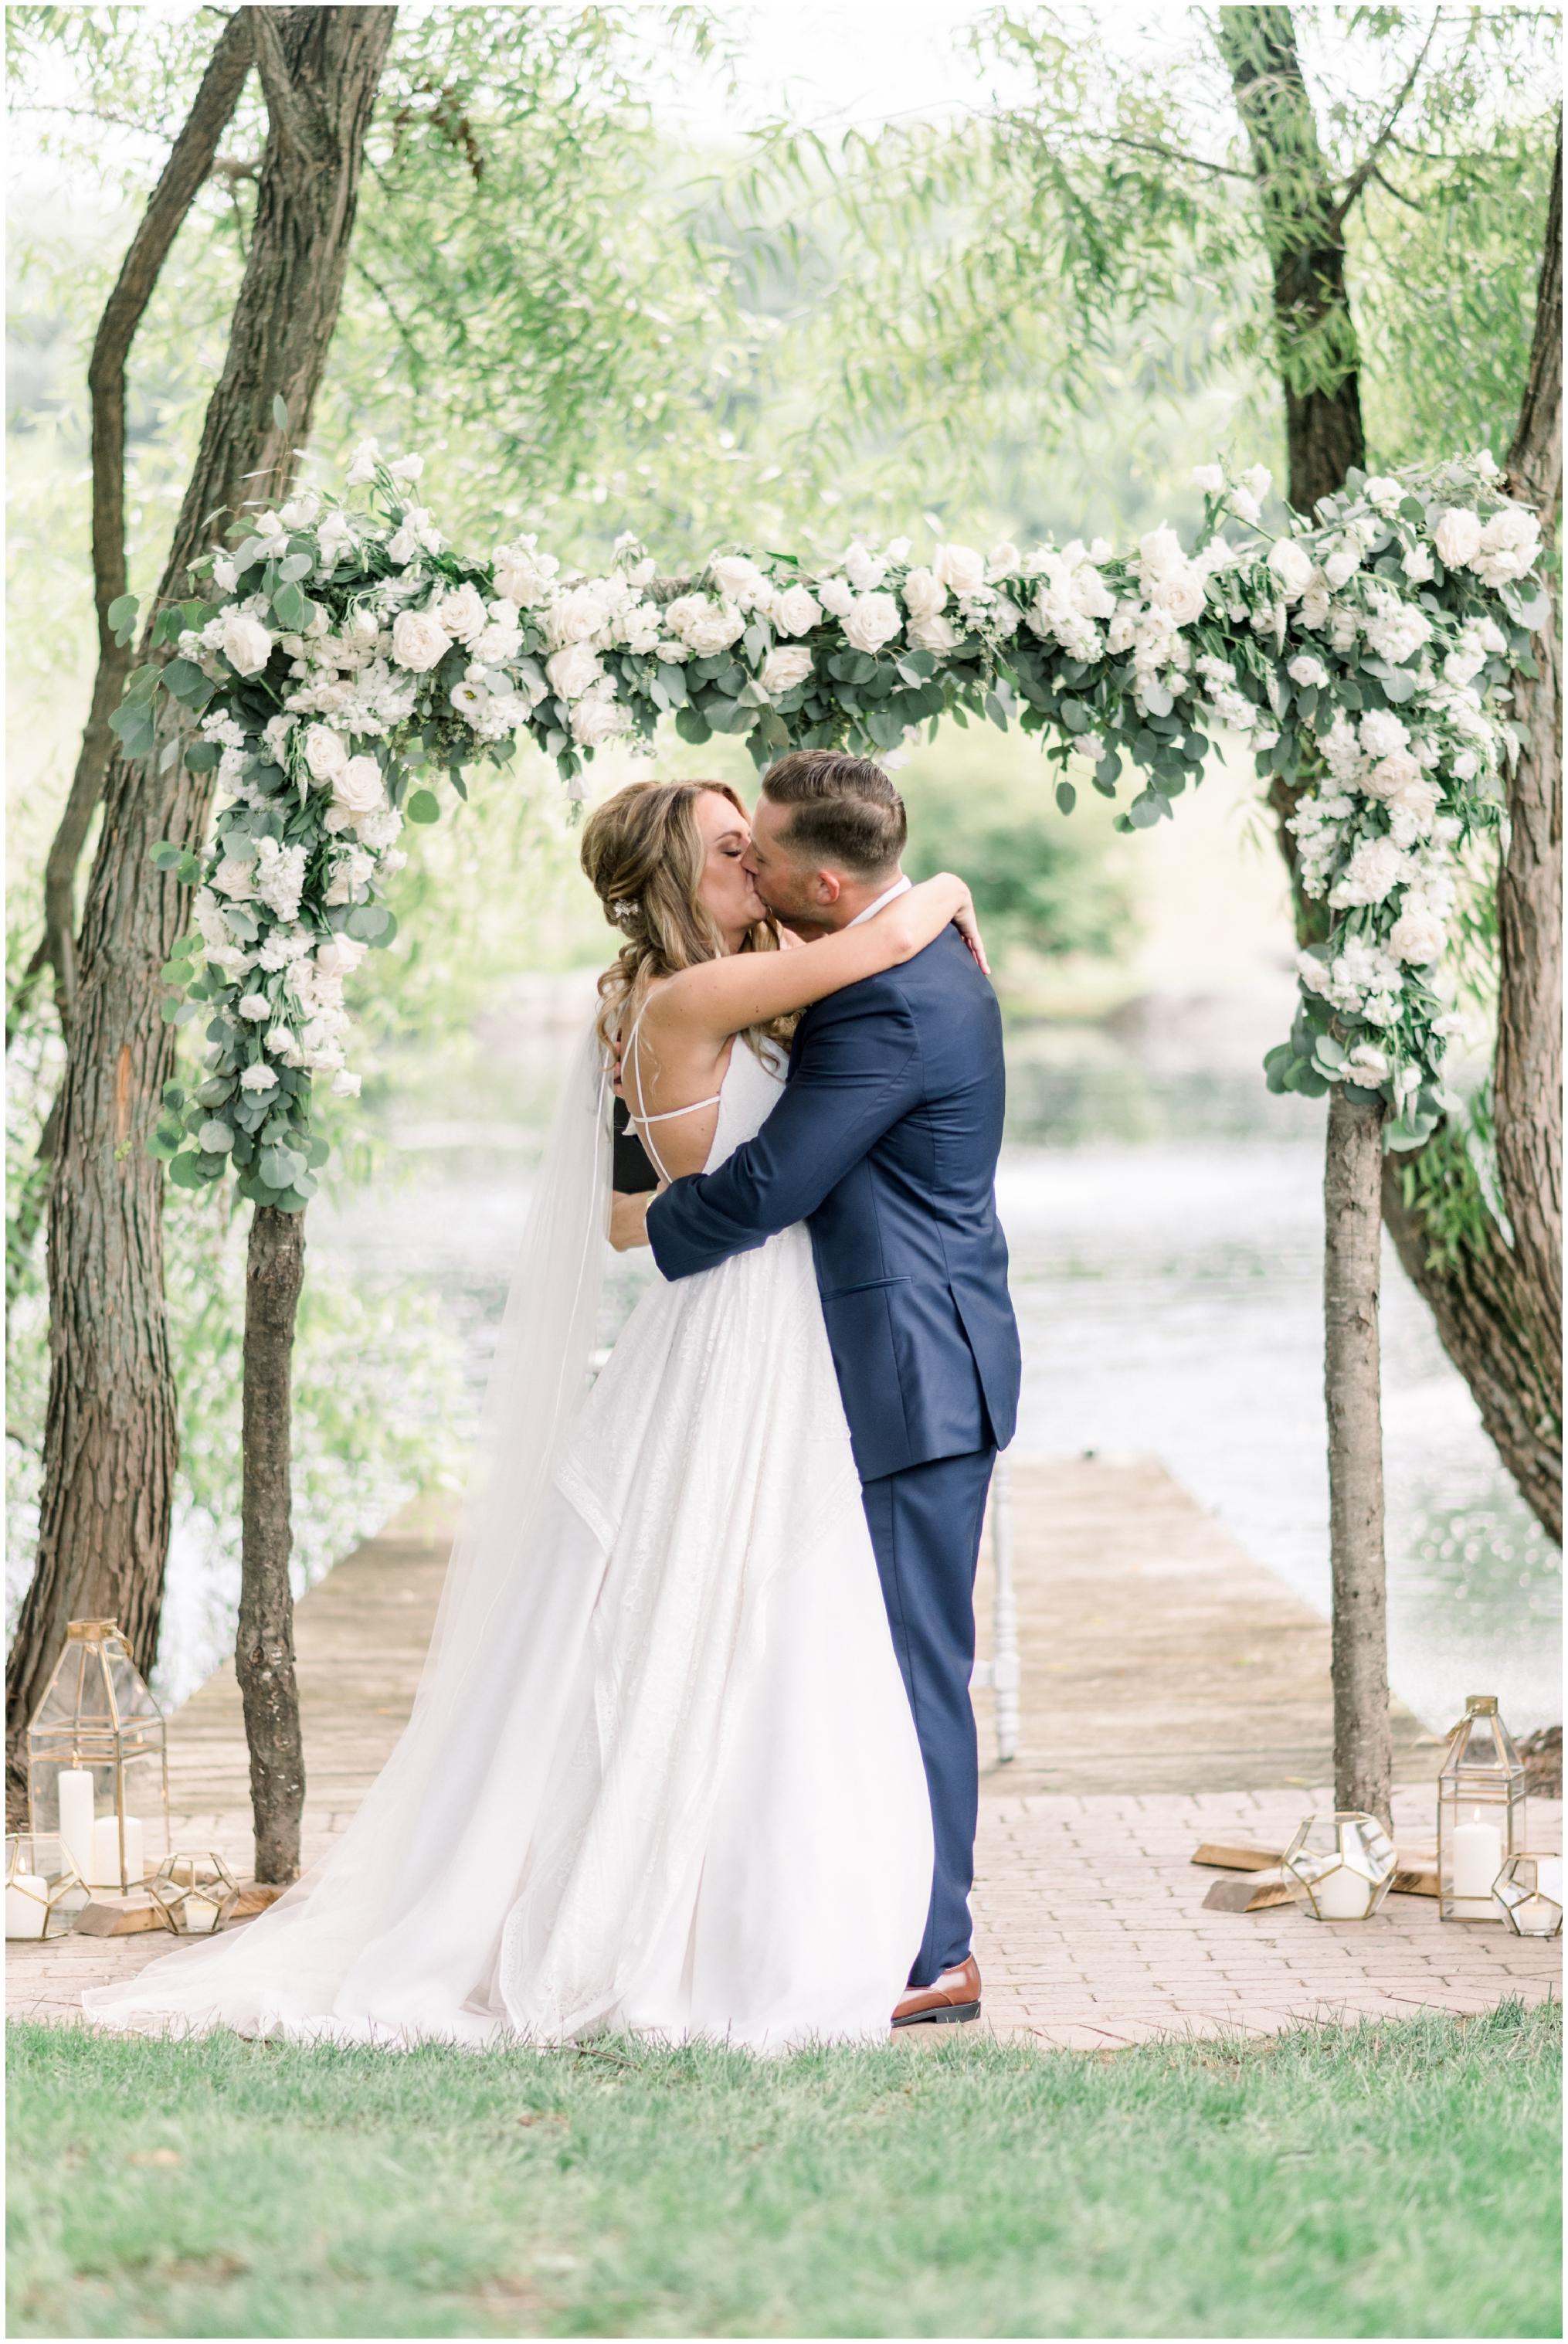 Krista Brackin Photography | July Wedding at The Farm at Eagle's Ridge_0020.jpg